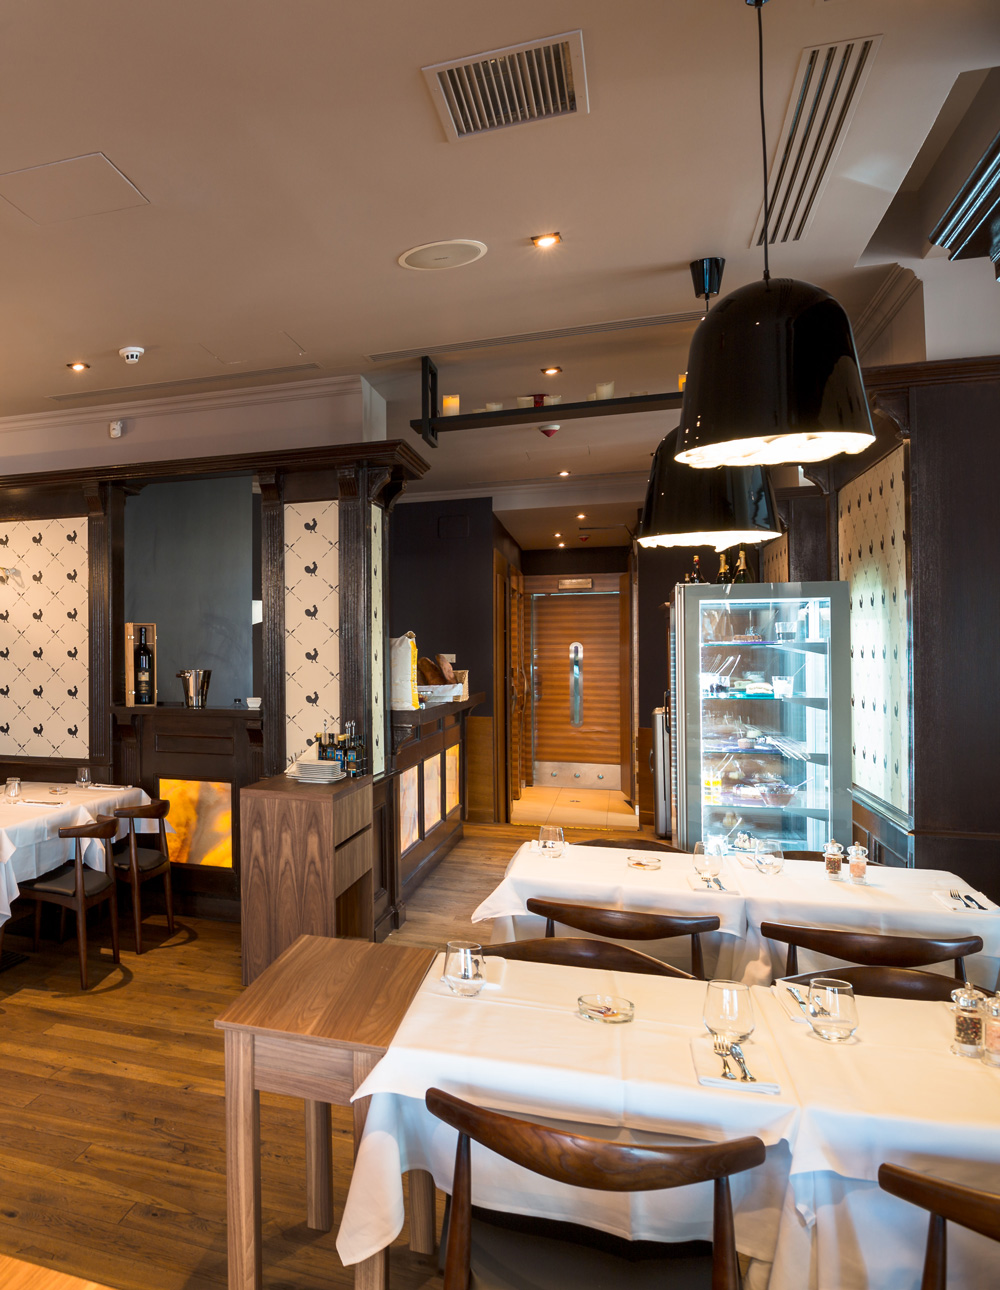 Despre redeschiderea restaurantului din Dorobanti, in Food & Bar Magazine